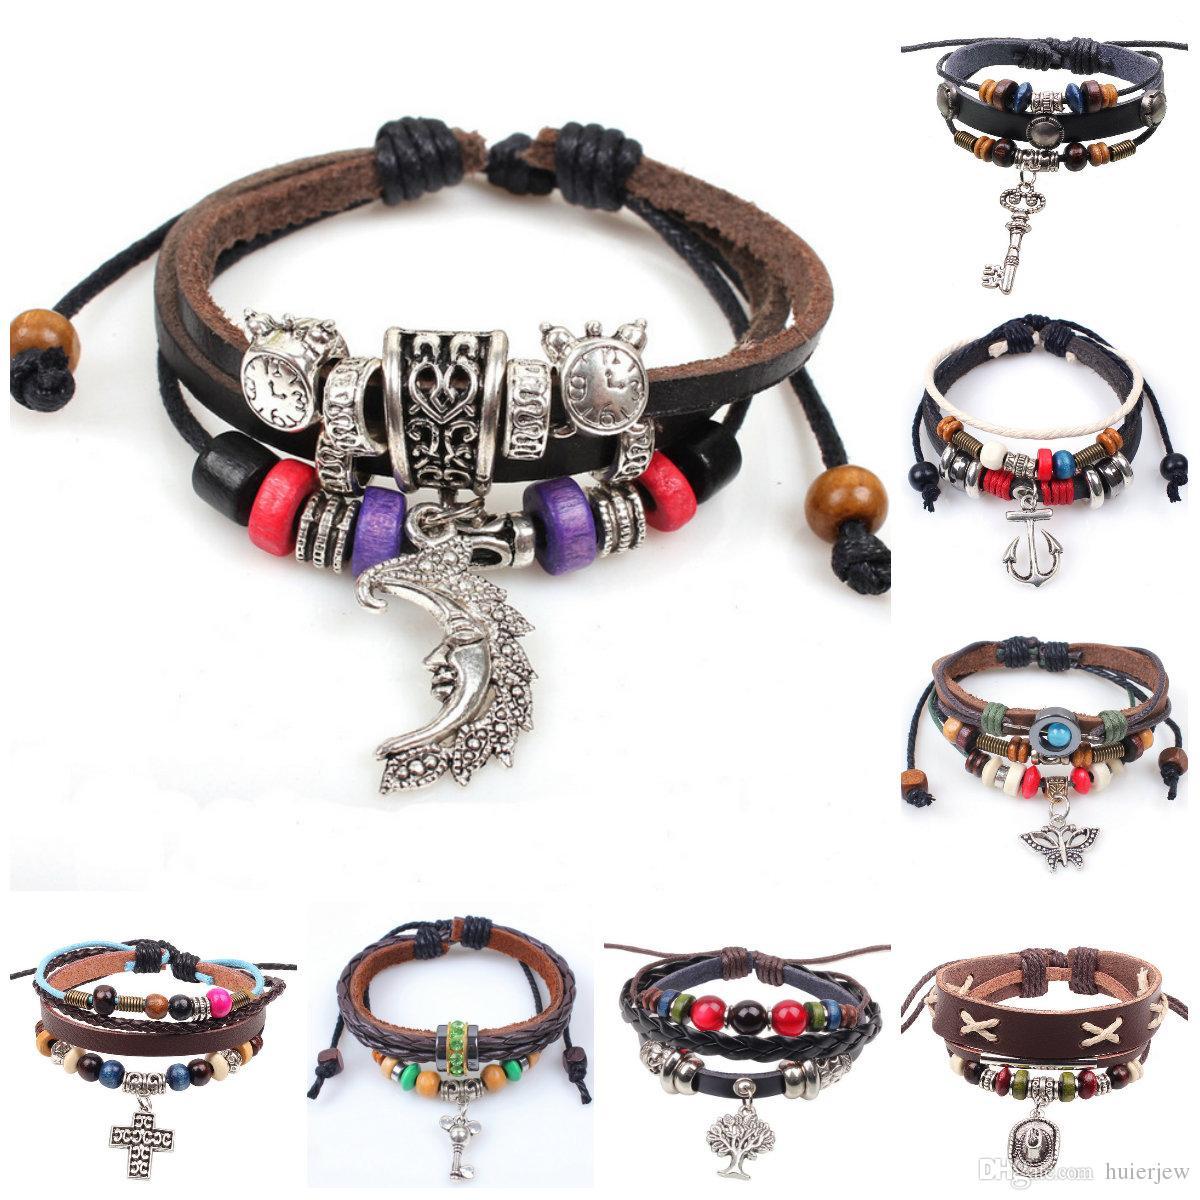 7757c3c66d44b Leather Bracelet For Women Mens Charms Bracelets Bangles Hand Woven Braided  Rope Genuine Leather Chain Bead Bracelet Infinity Bracelets